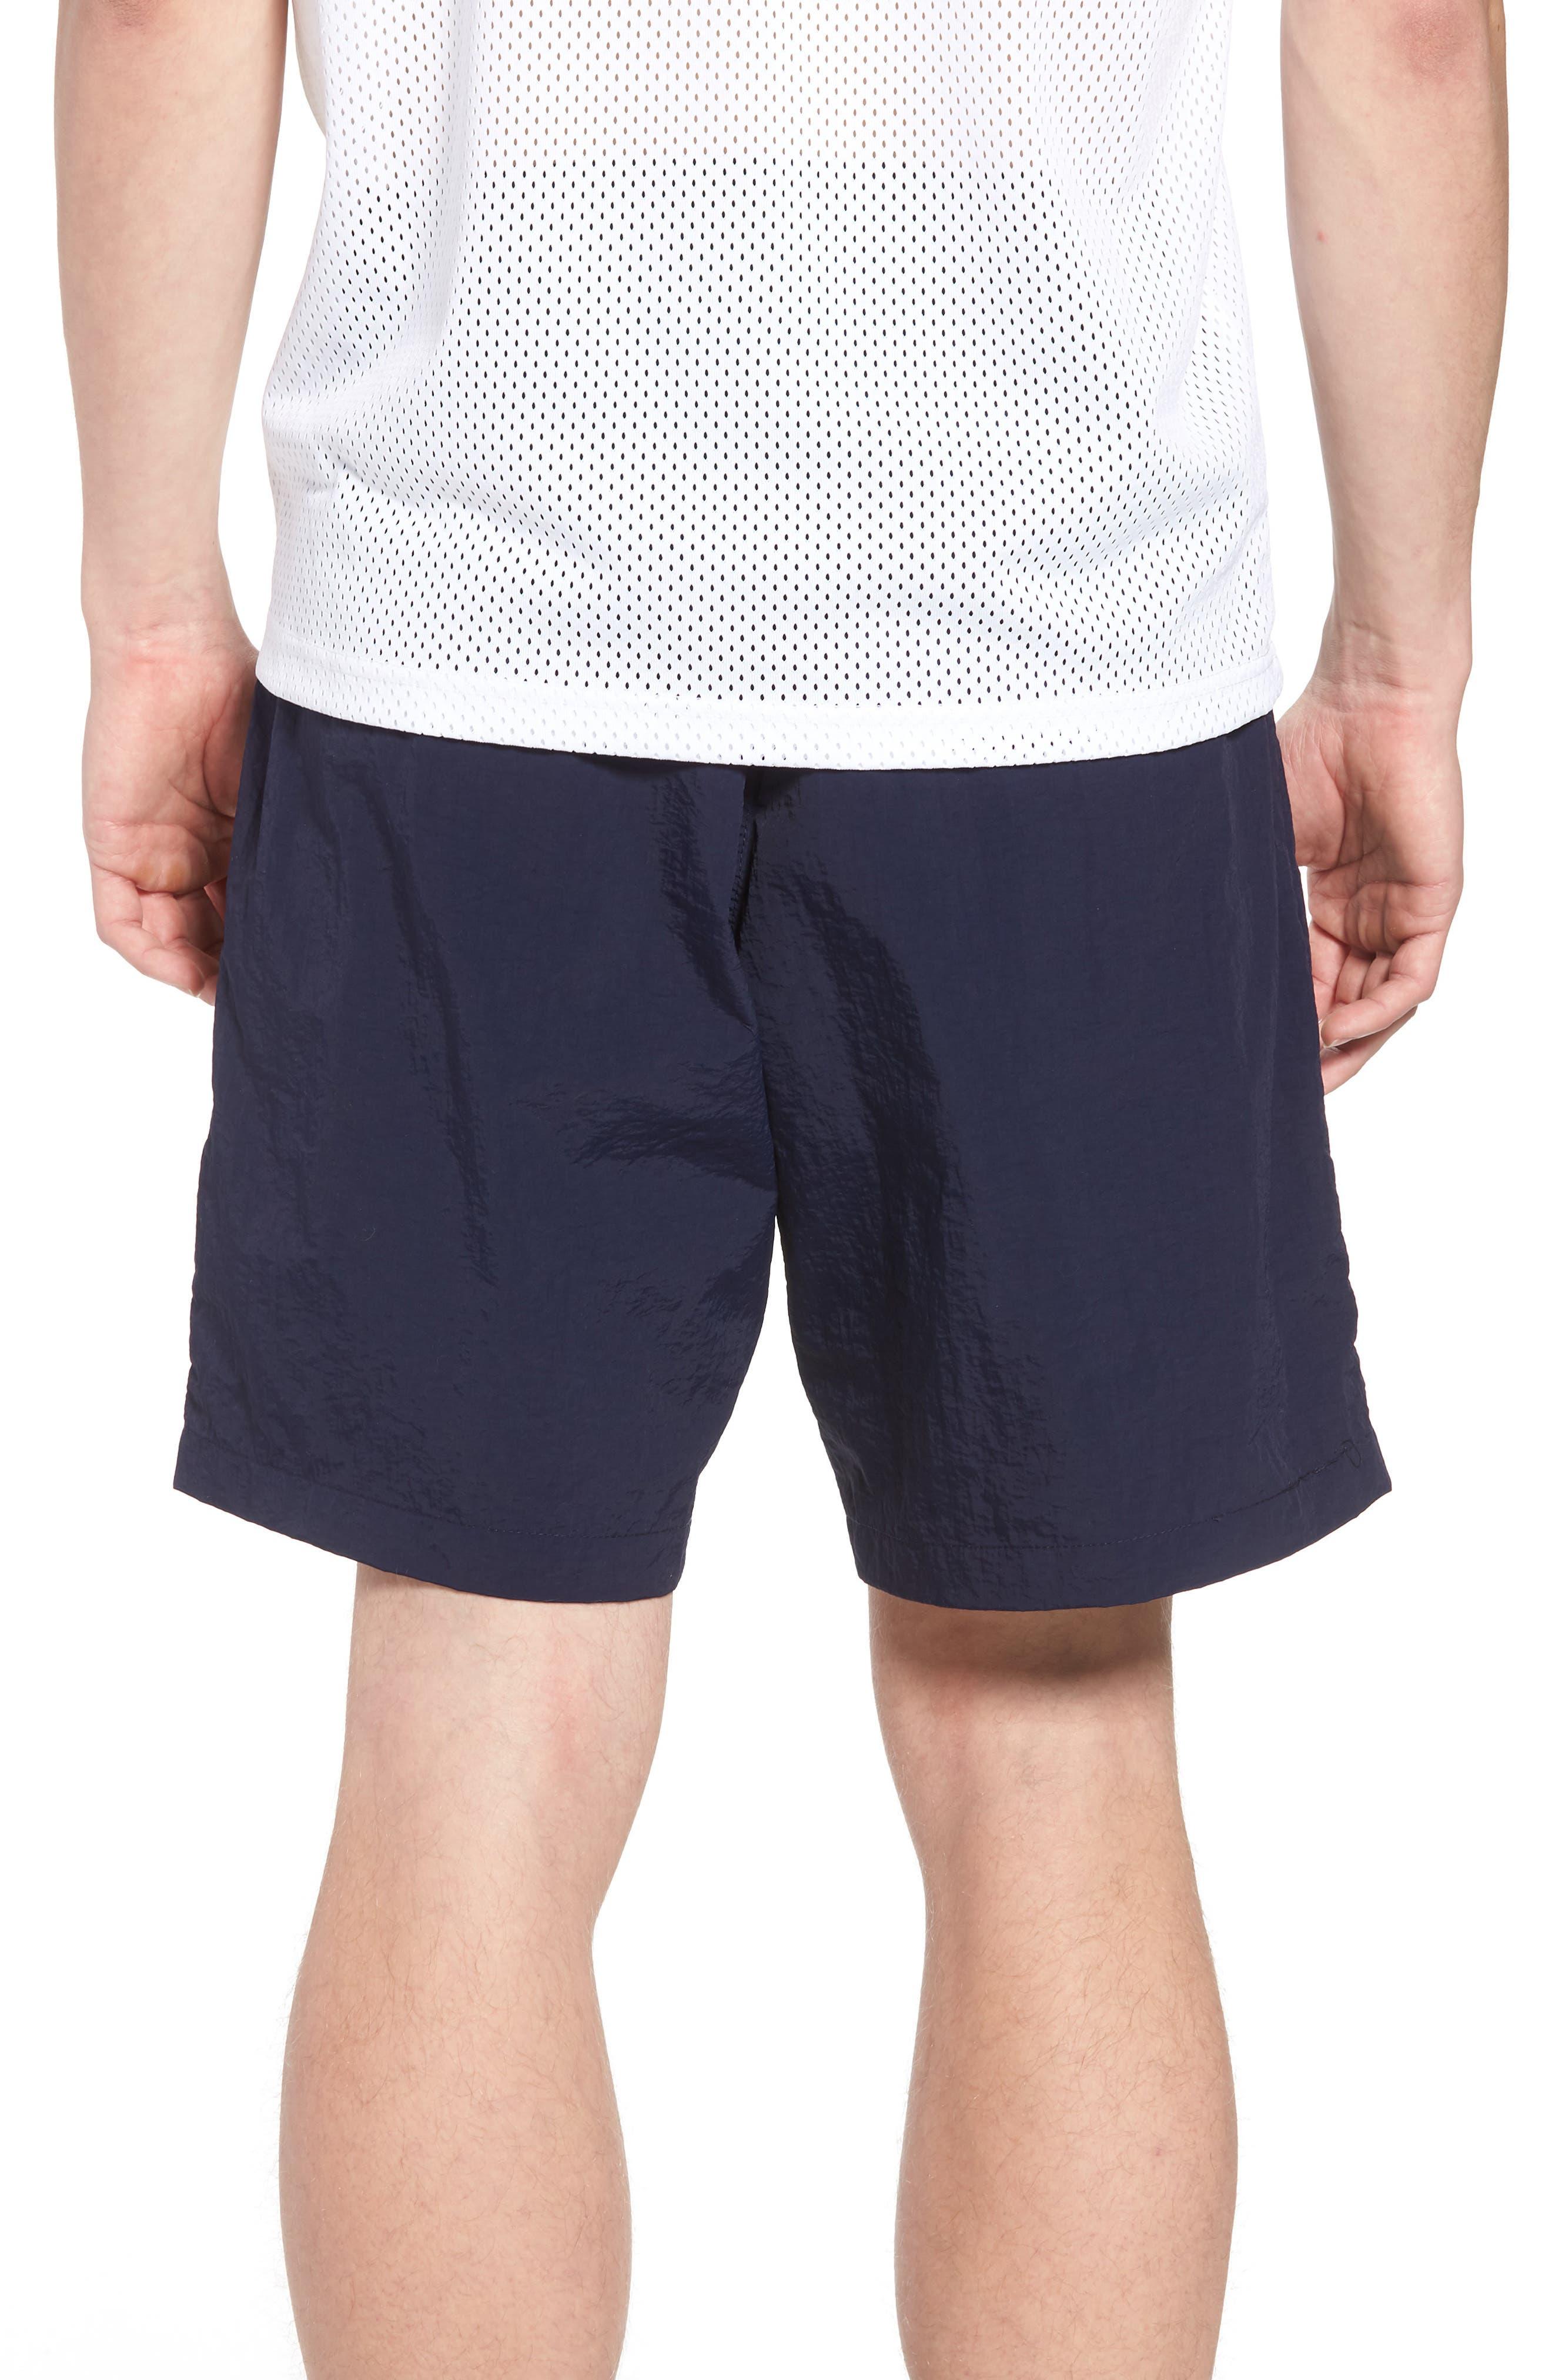 Mondy Shorts,                             Alternate thumbnail 9, color,